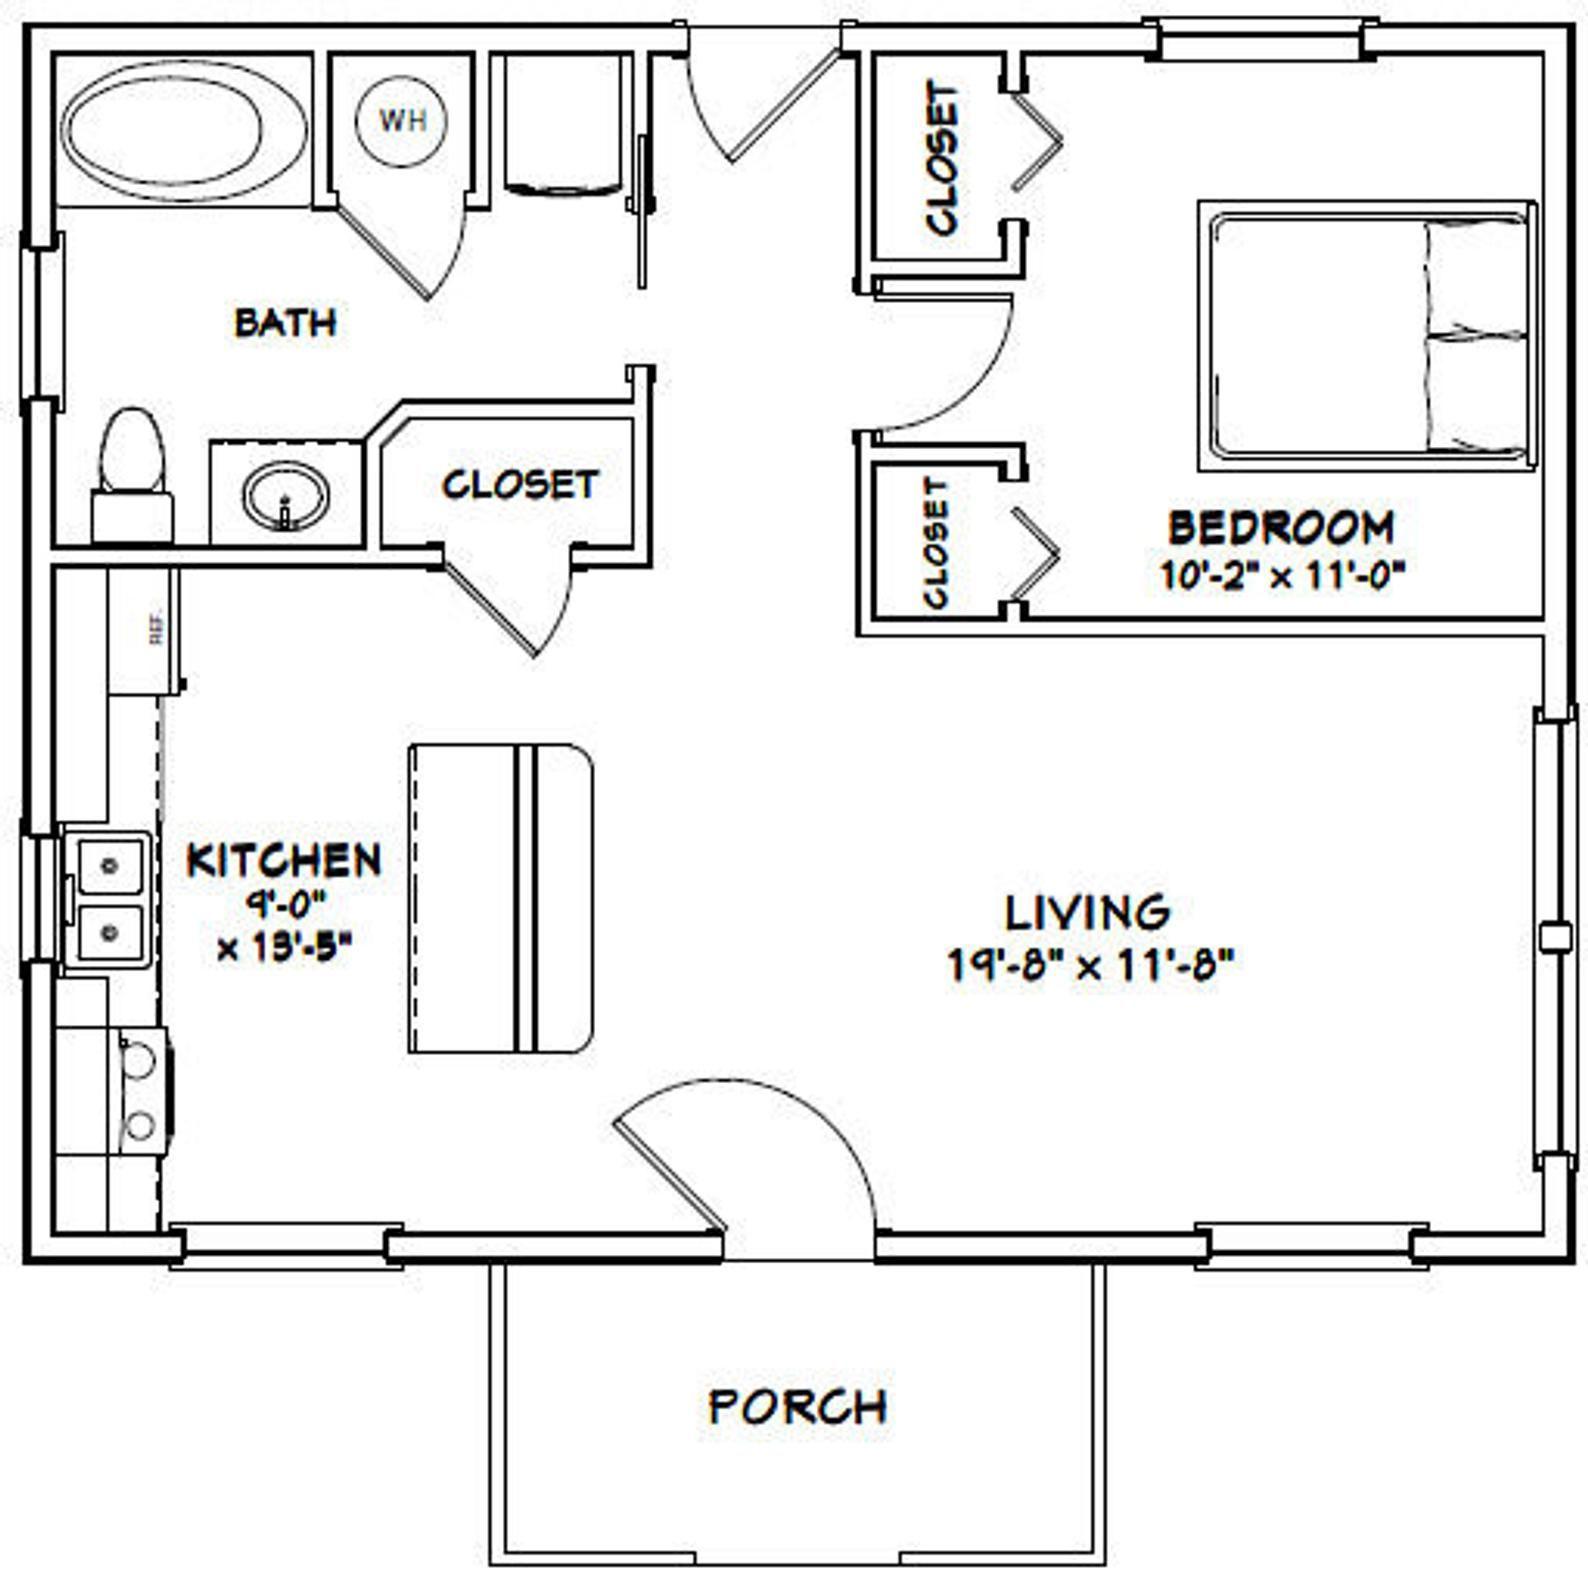 30x24 House 1 Bedroom 1 Bath 720 Sq Ft Pdf Floor Plan Etsy In 2021 Small House Floor Plans Small House Plans Tiny House Floor Plans